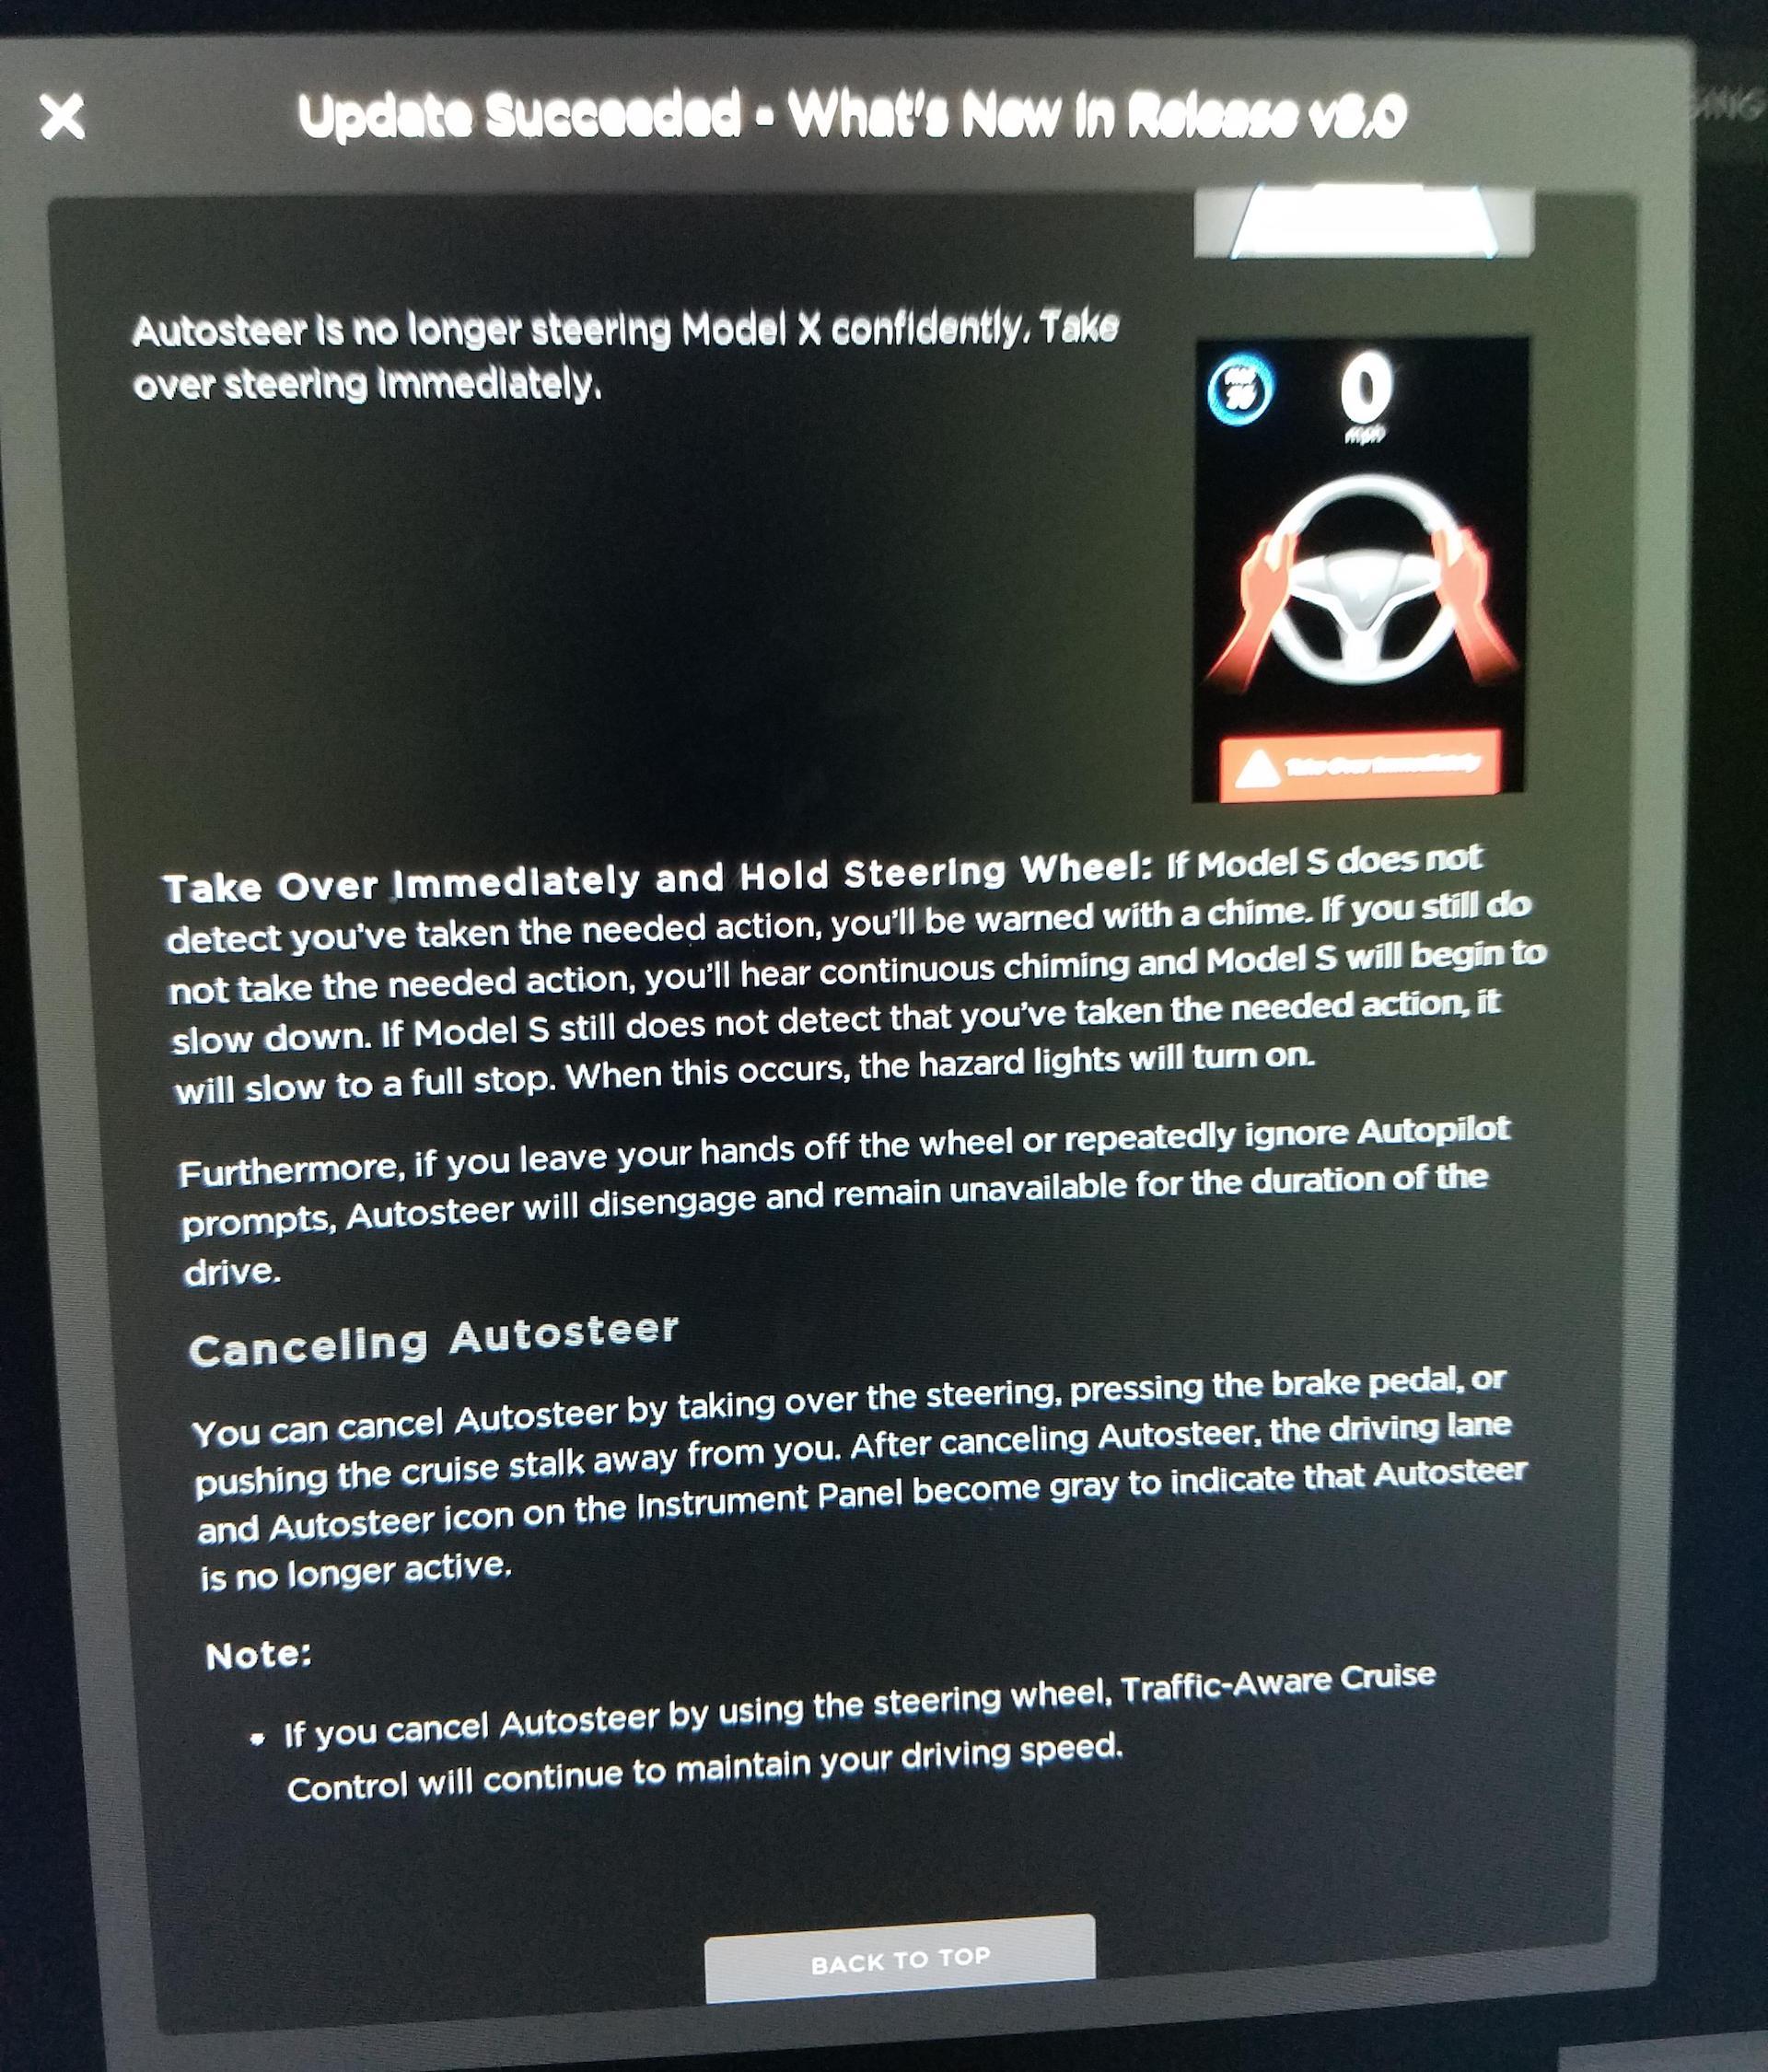 Tesla_Enhanced_Autopilot_release-notes-7